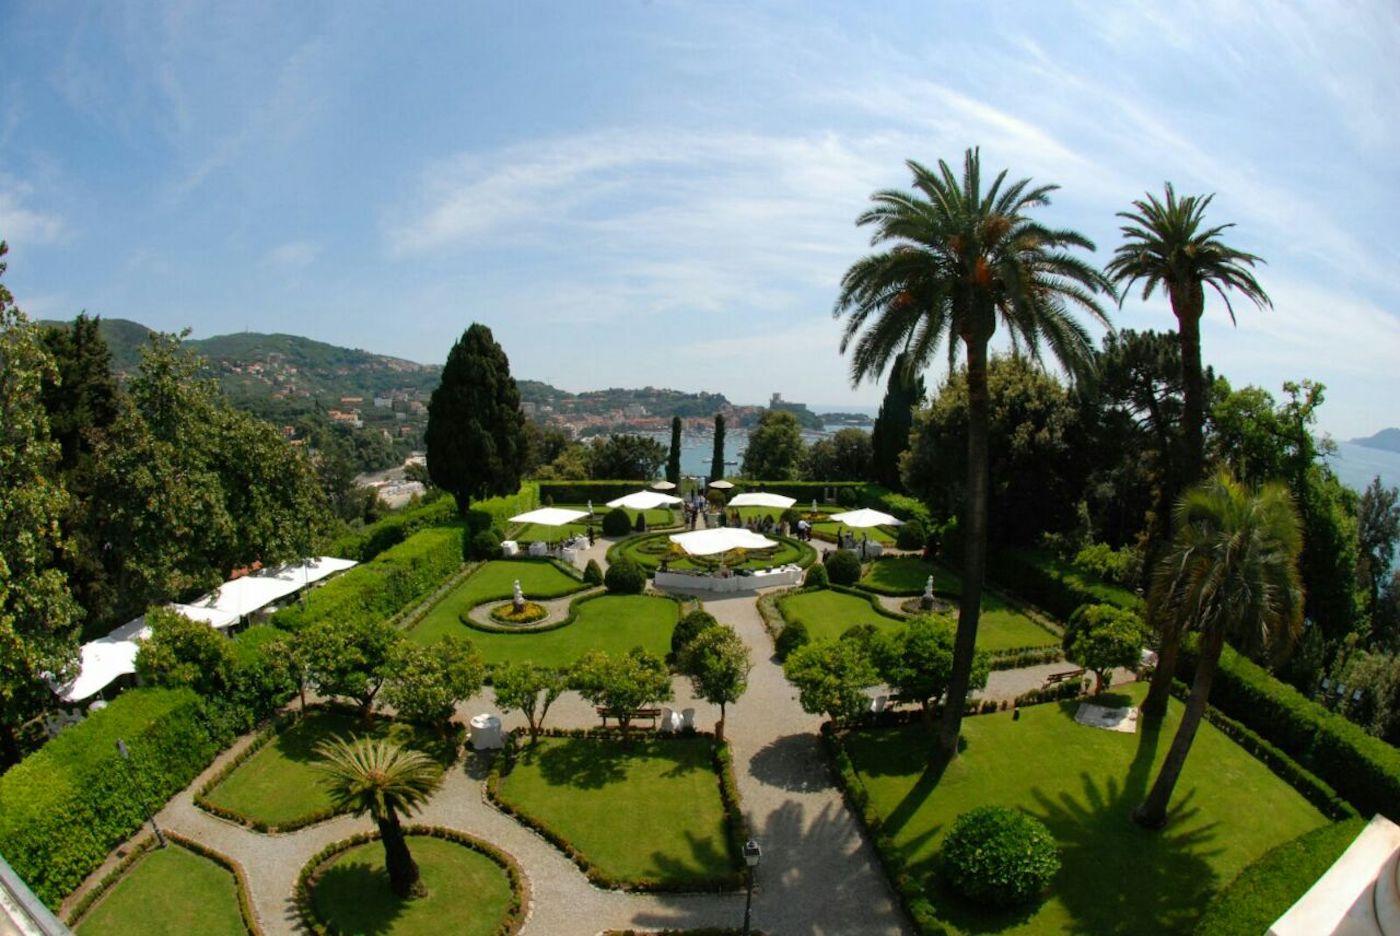 Creativo Grandi Giardini Italiani Immagine Di Giardino Stile